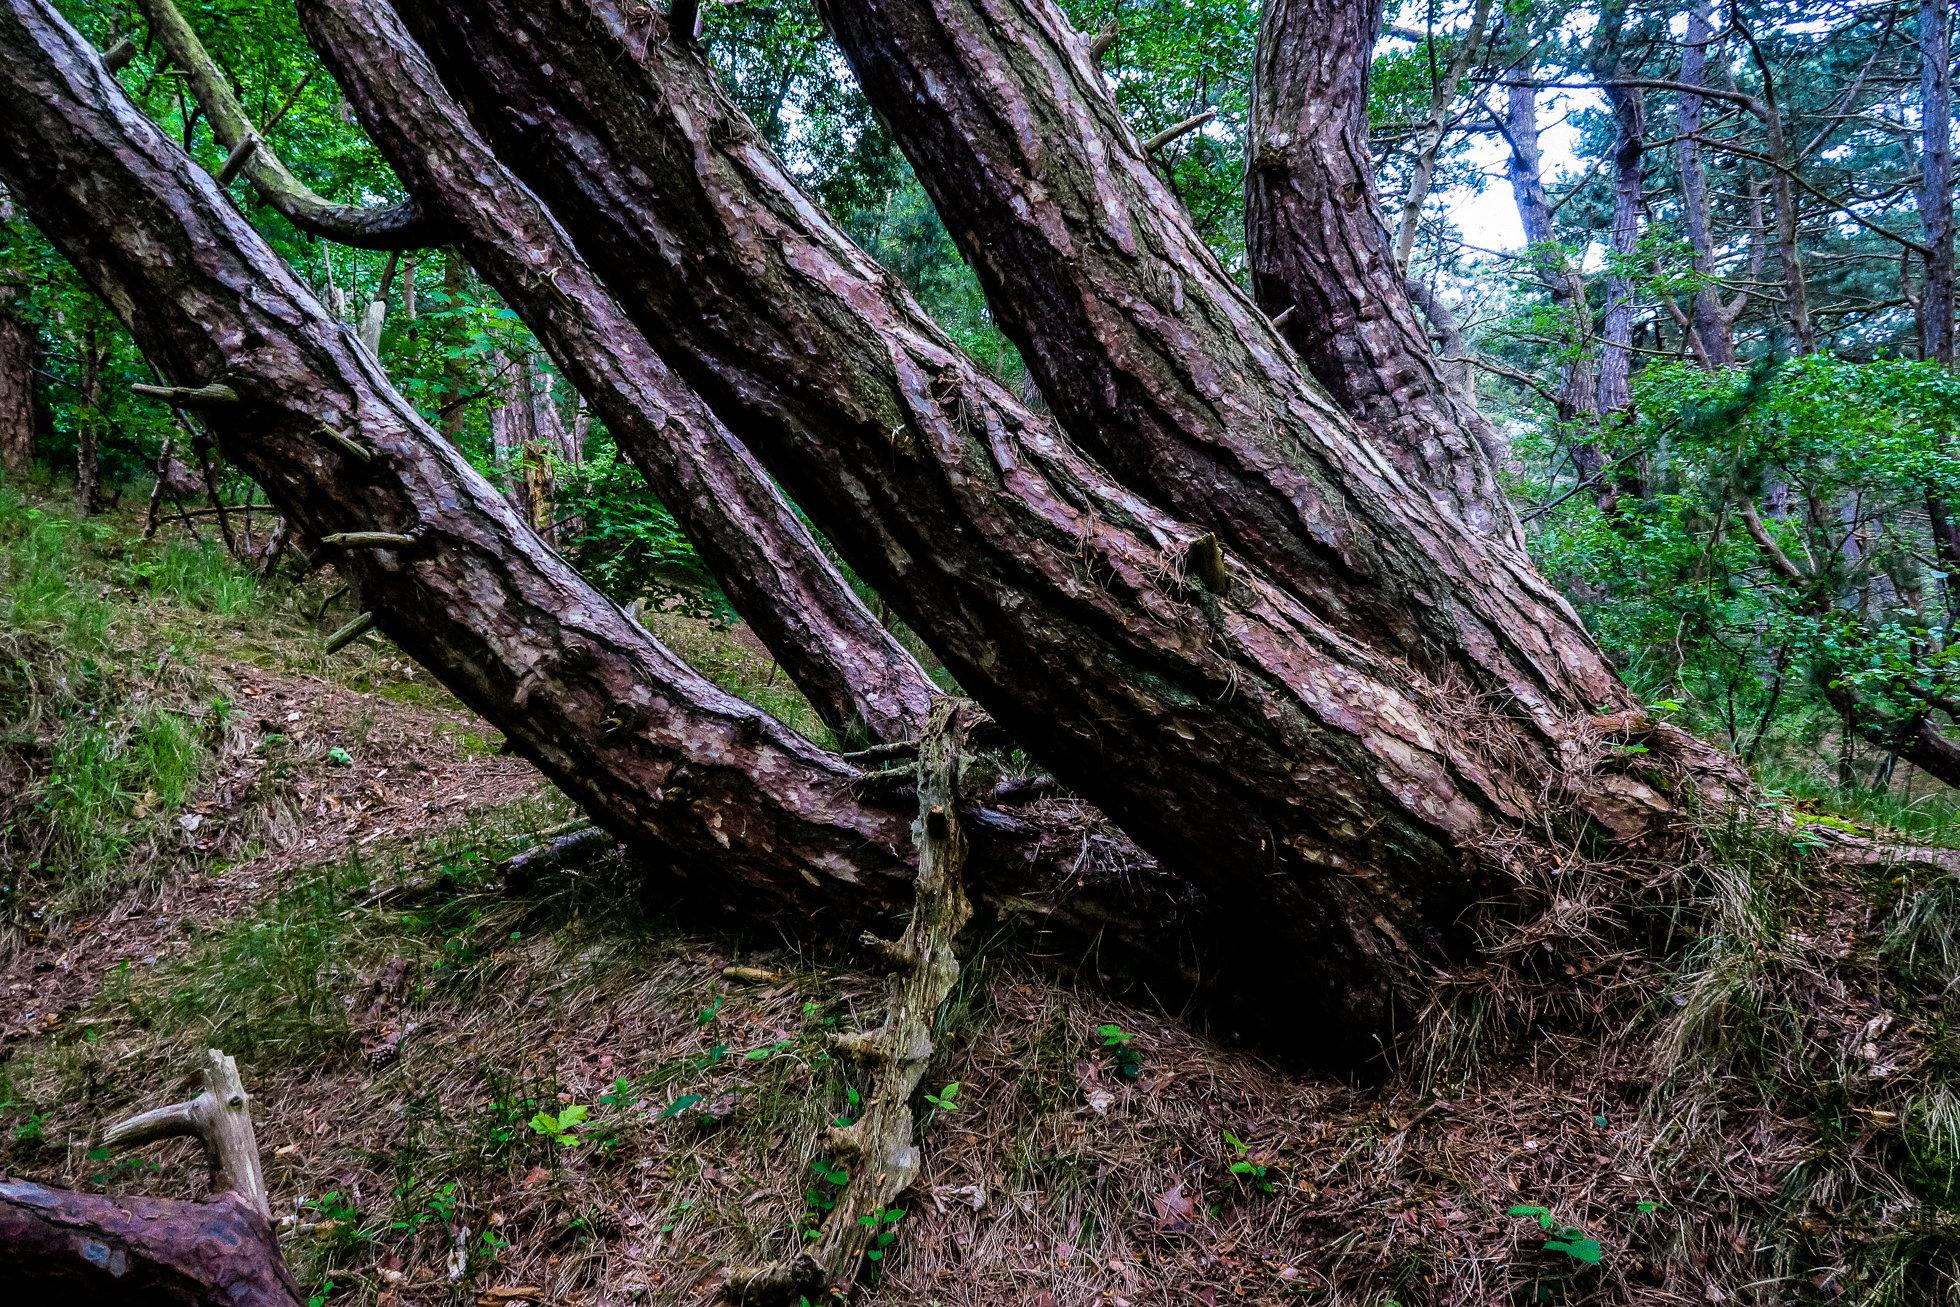 The_Wood-1409.jpg